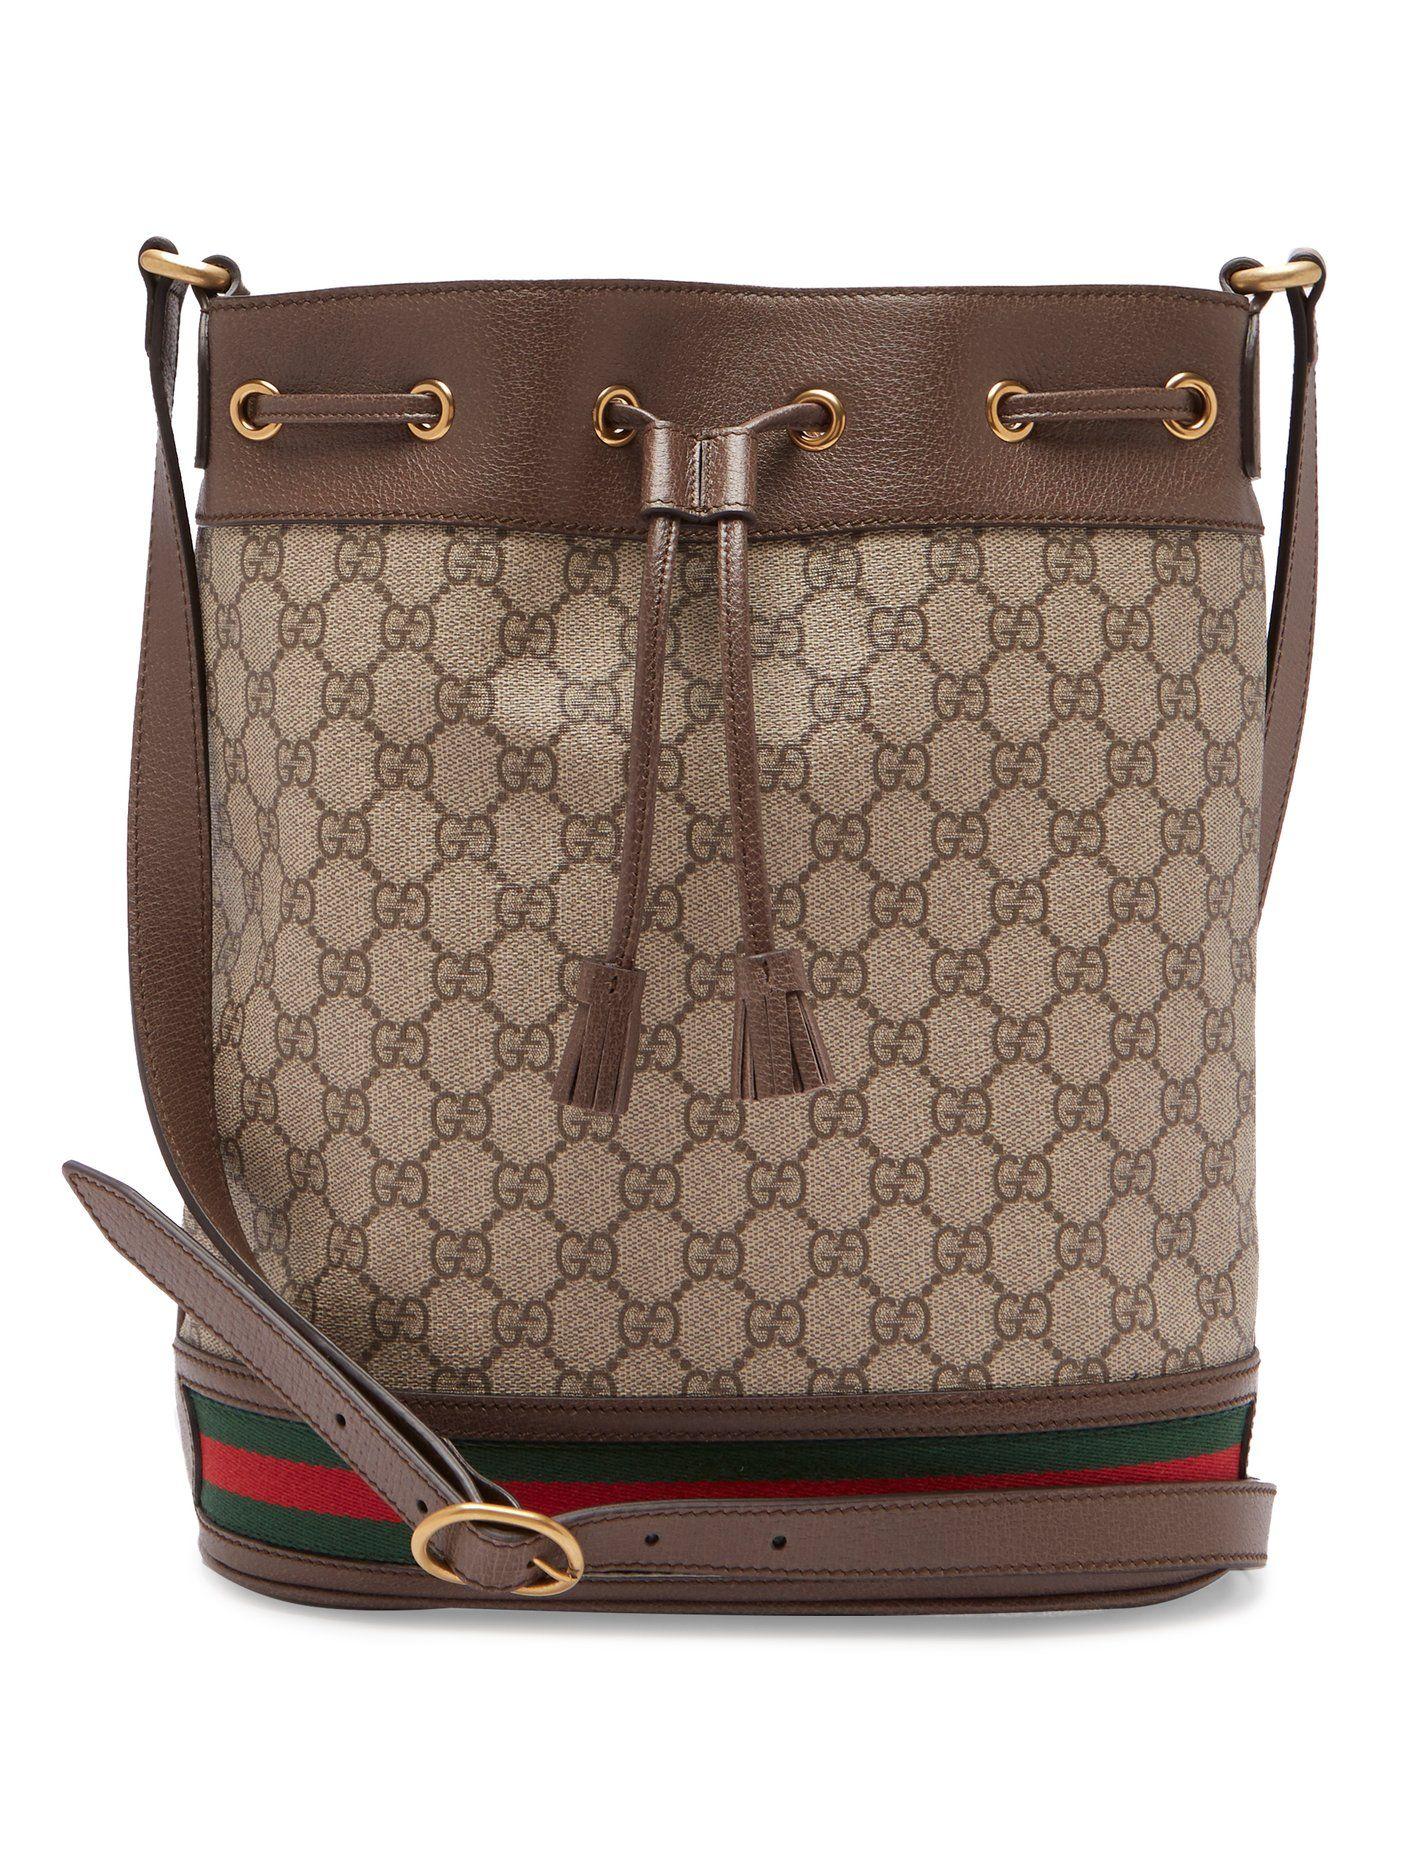 5714c397b Ophidia GG Supreme leather bucket bag | Gucci | MATCHESFASHION.COM ...